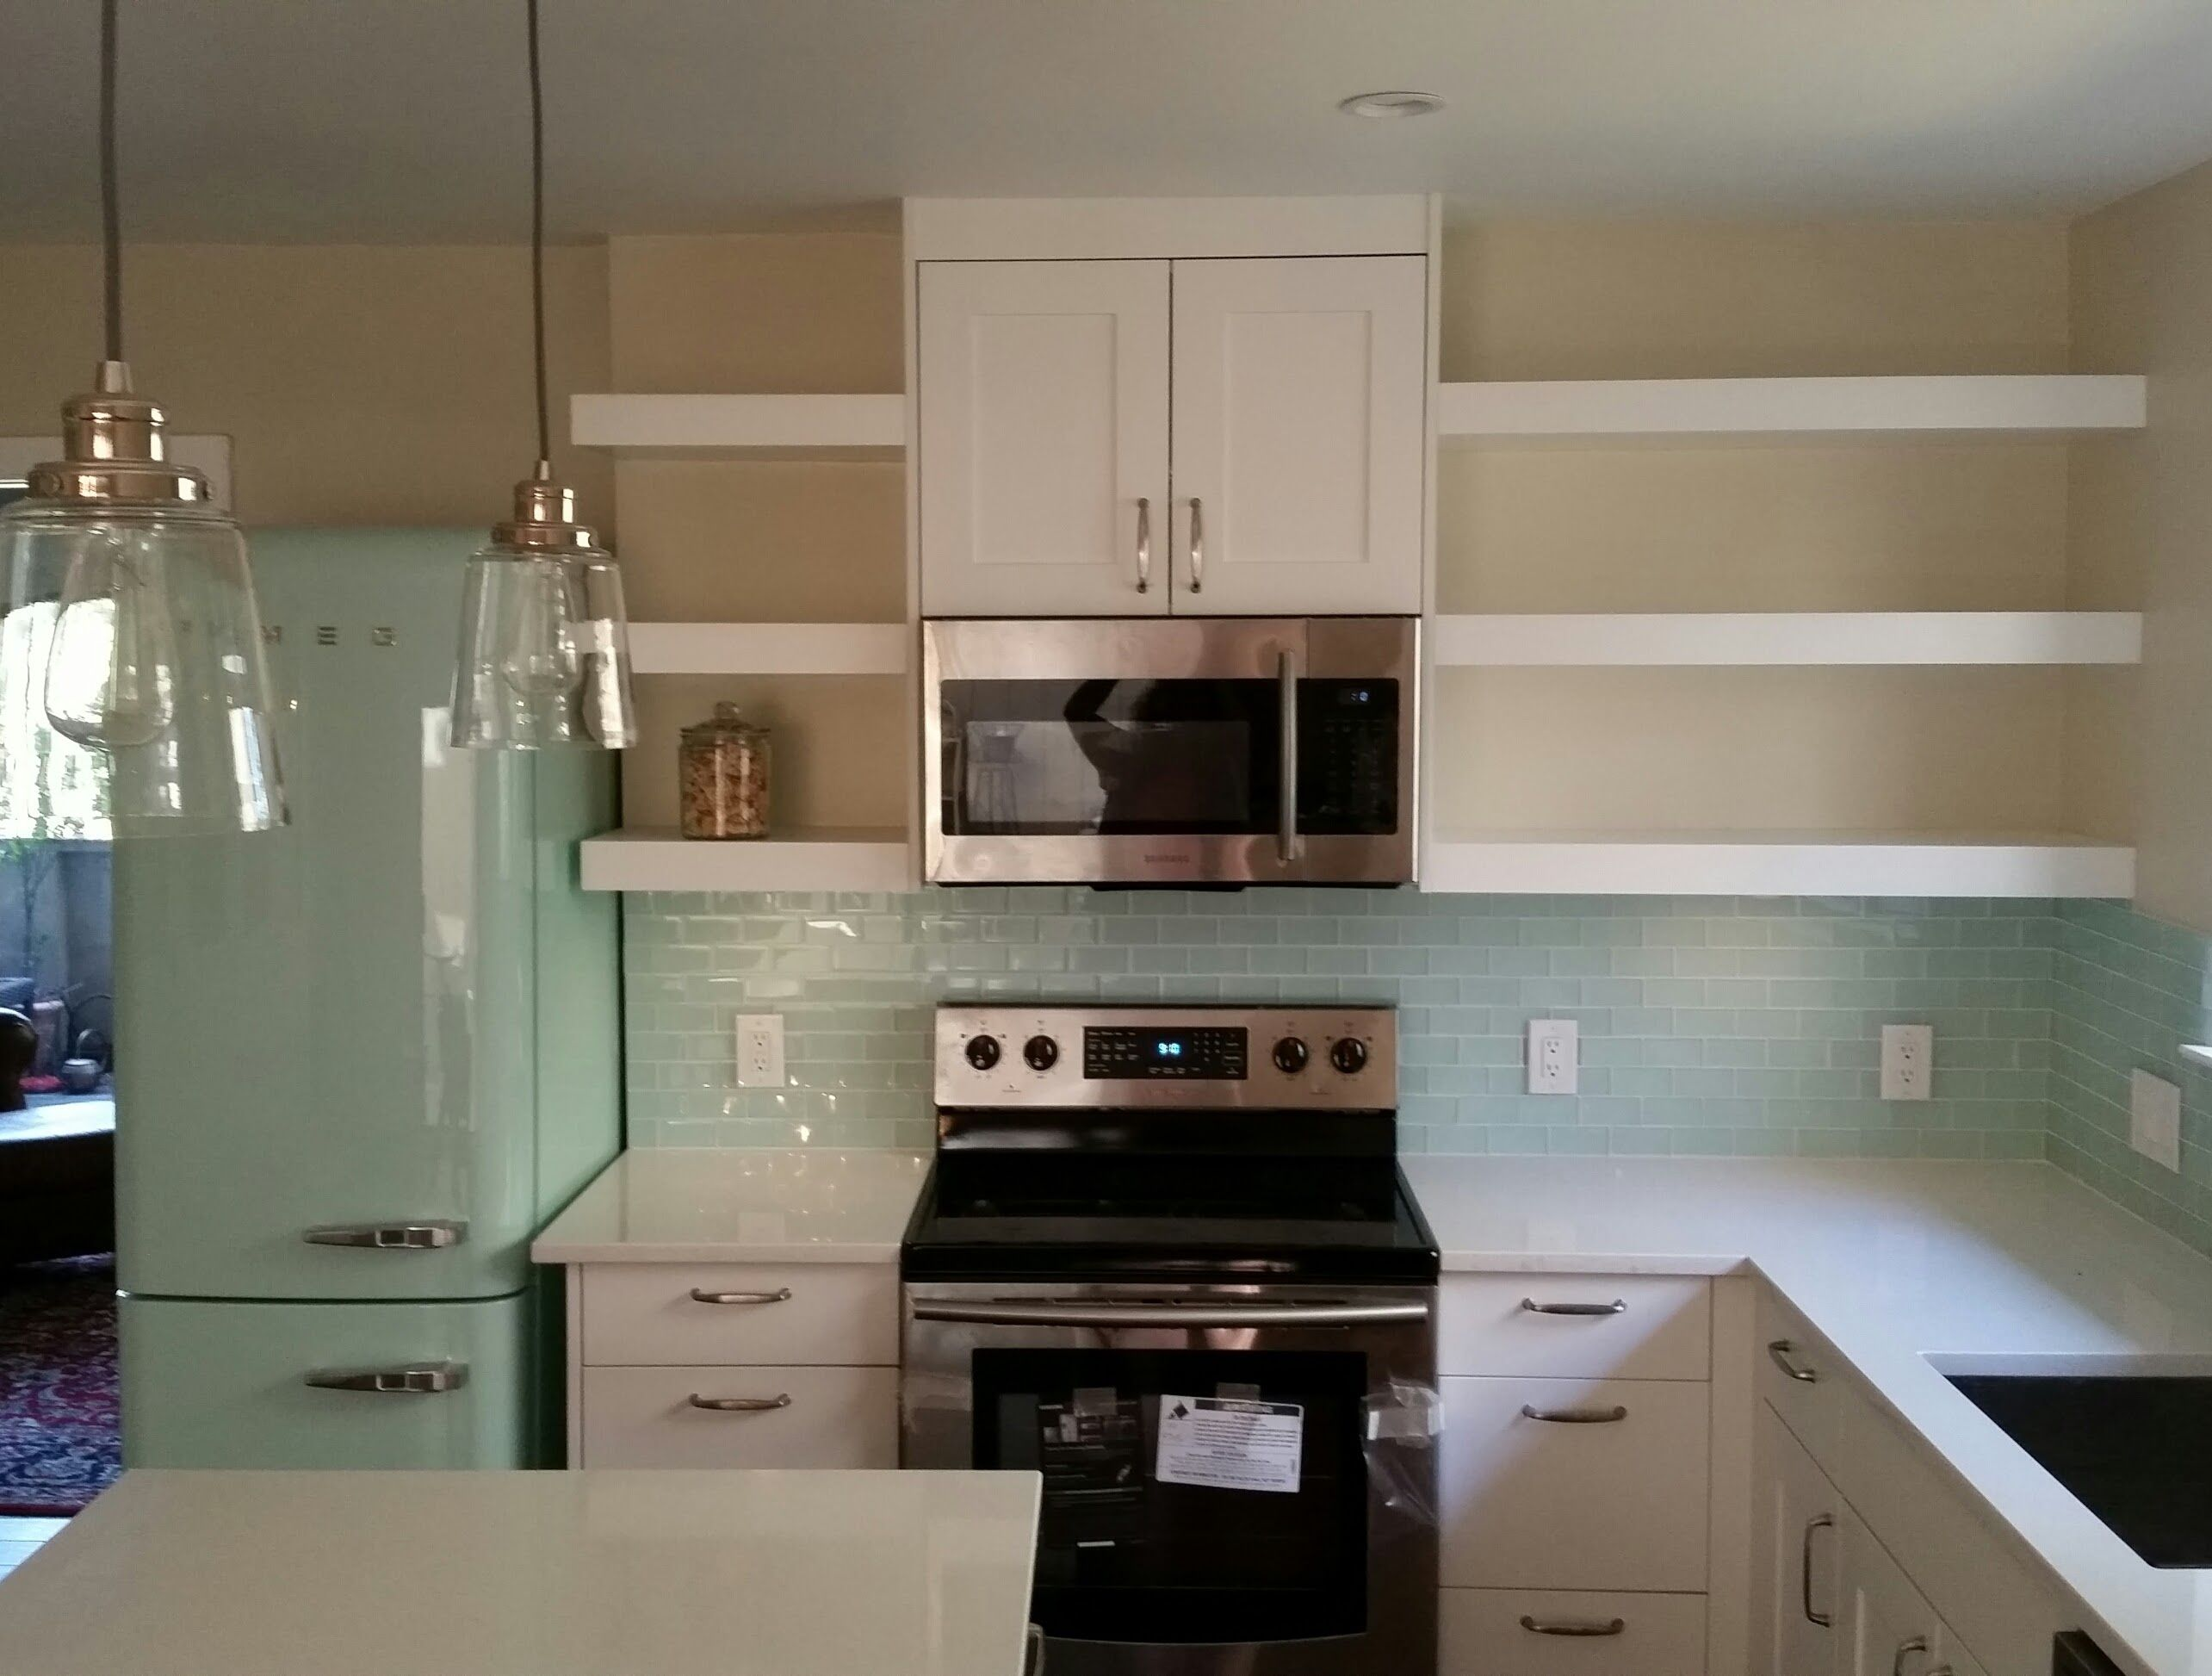 SMEG mint fridge glass tile samsung OTR microwave with vent hood